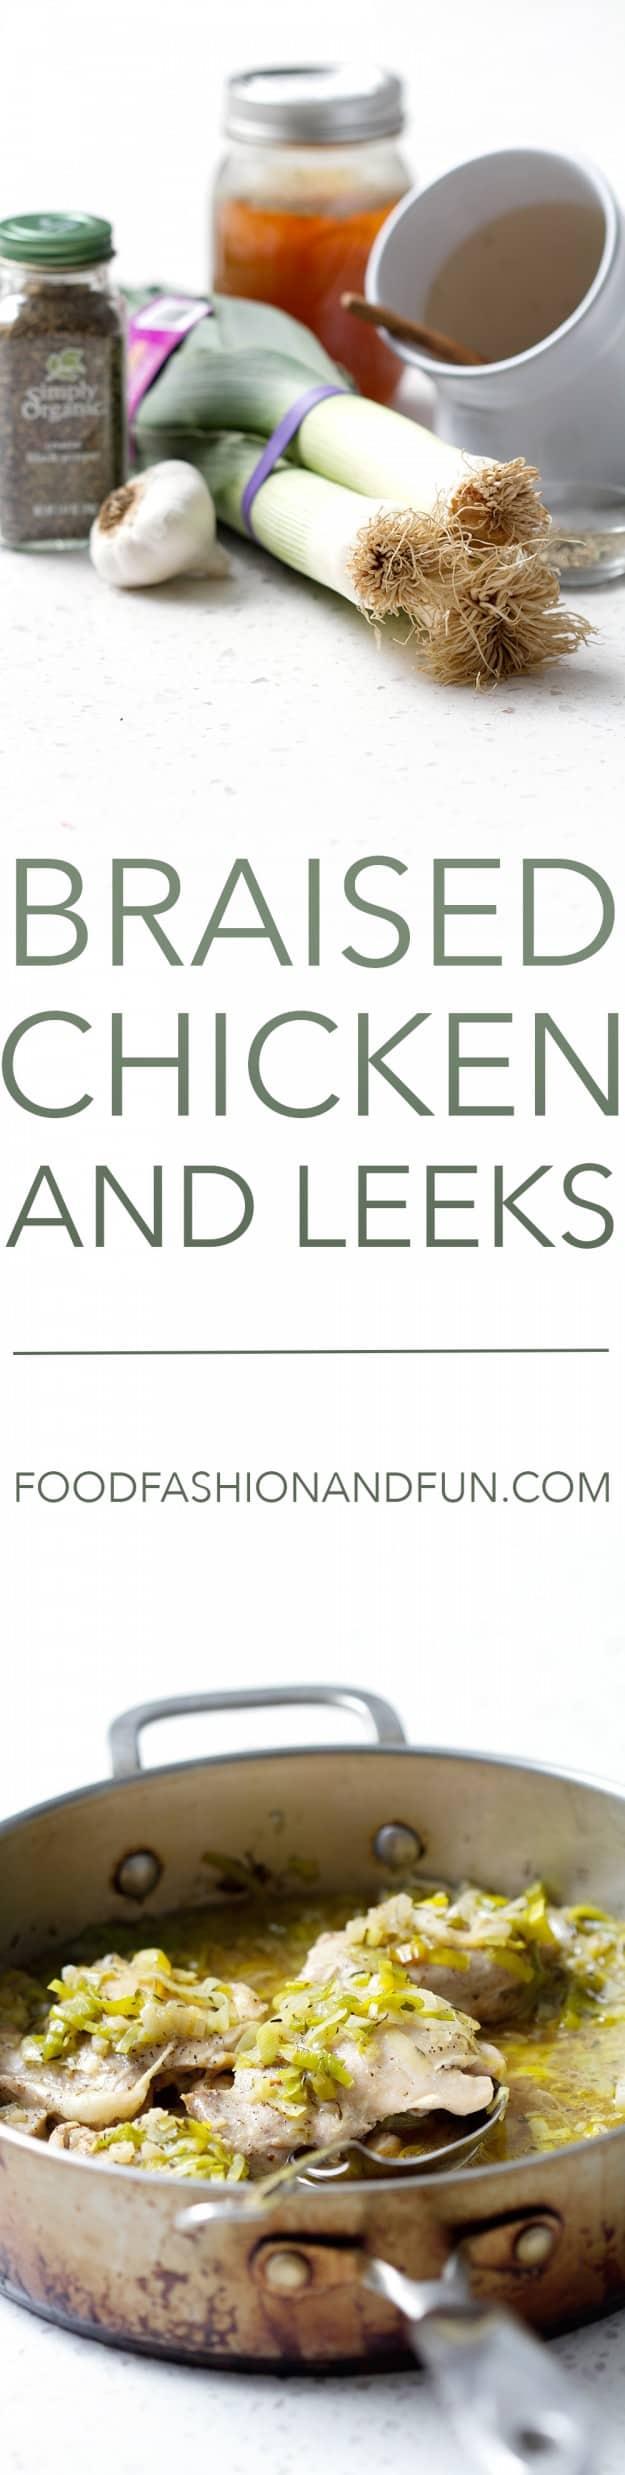 Braised Chicken and Leeks